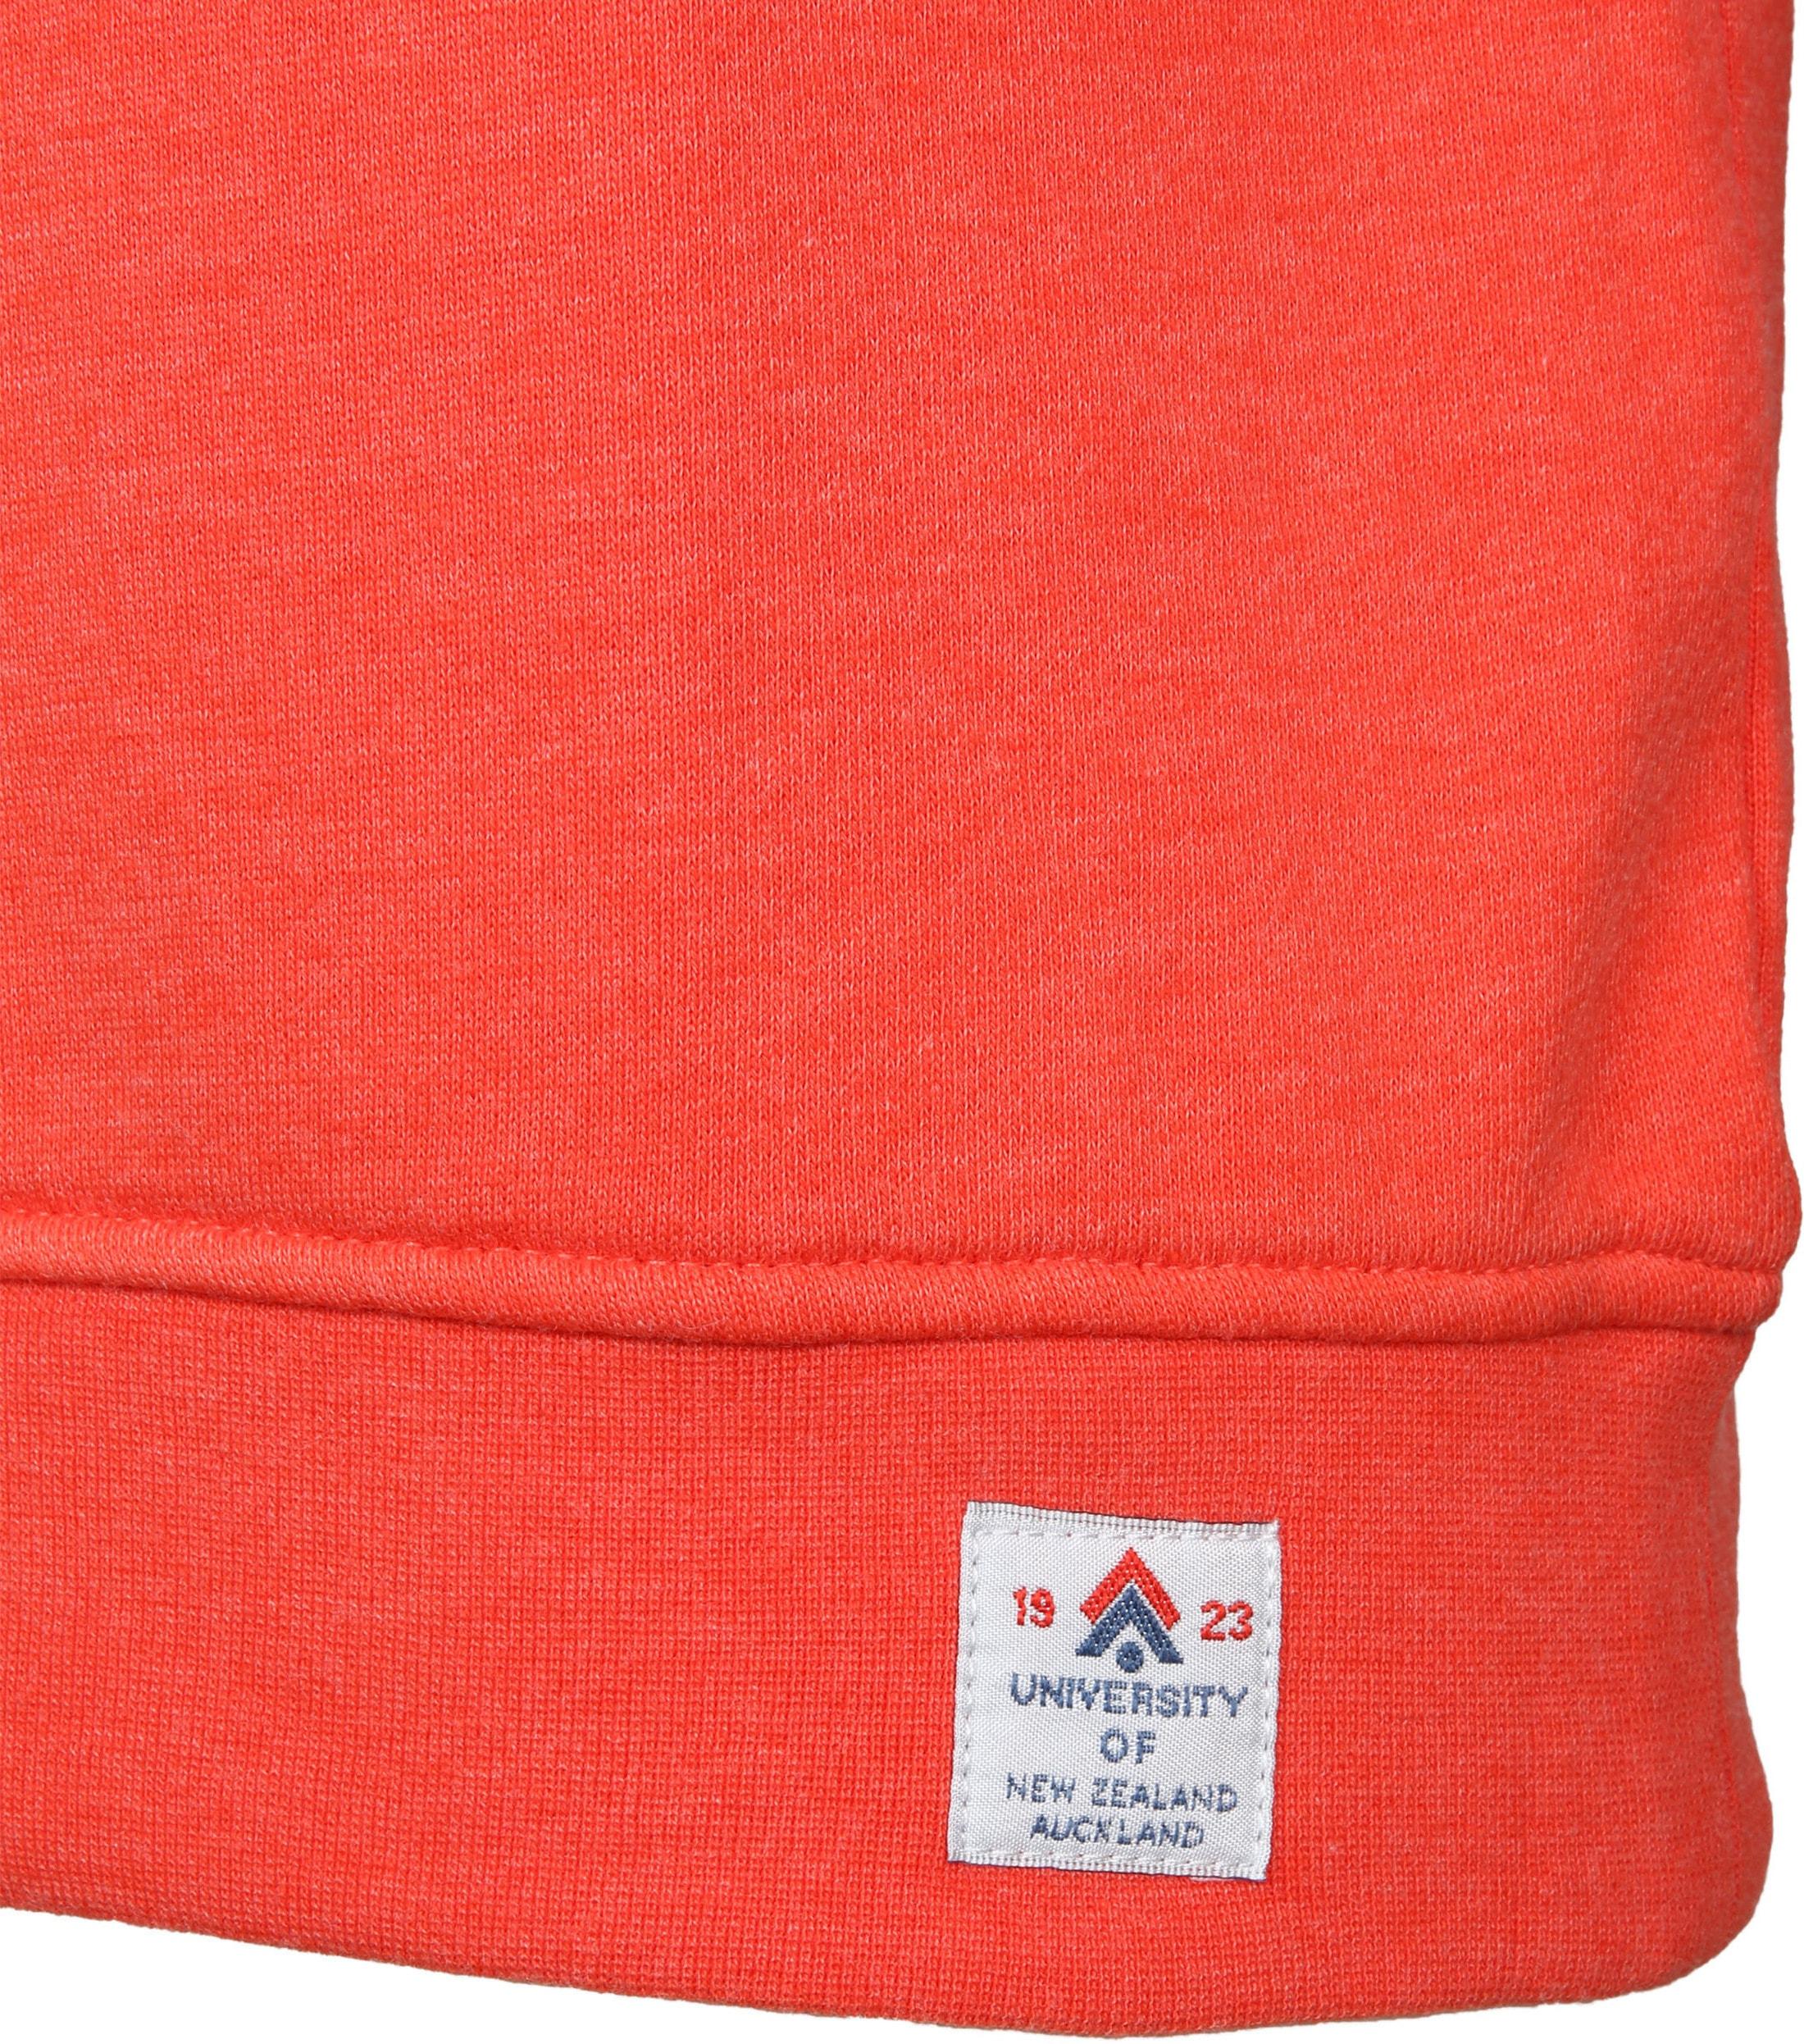 NZA Pullover Orange Logo foto 4